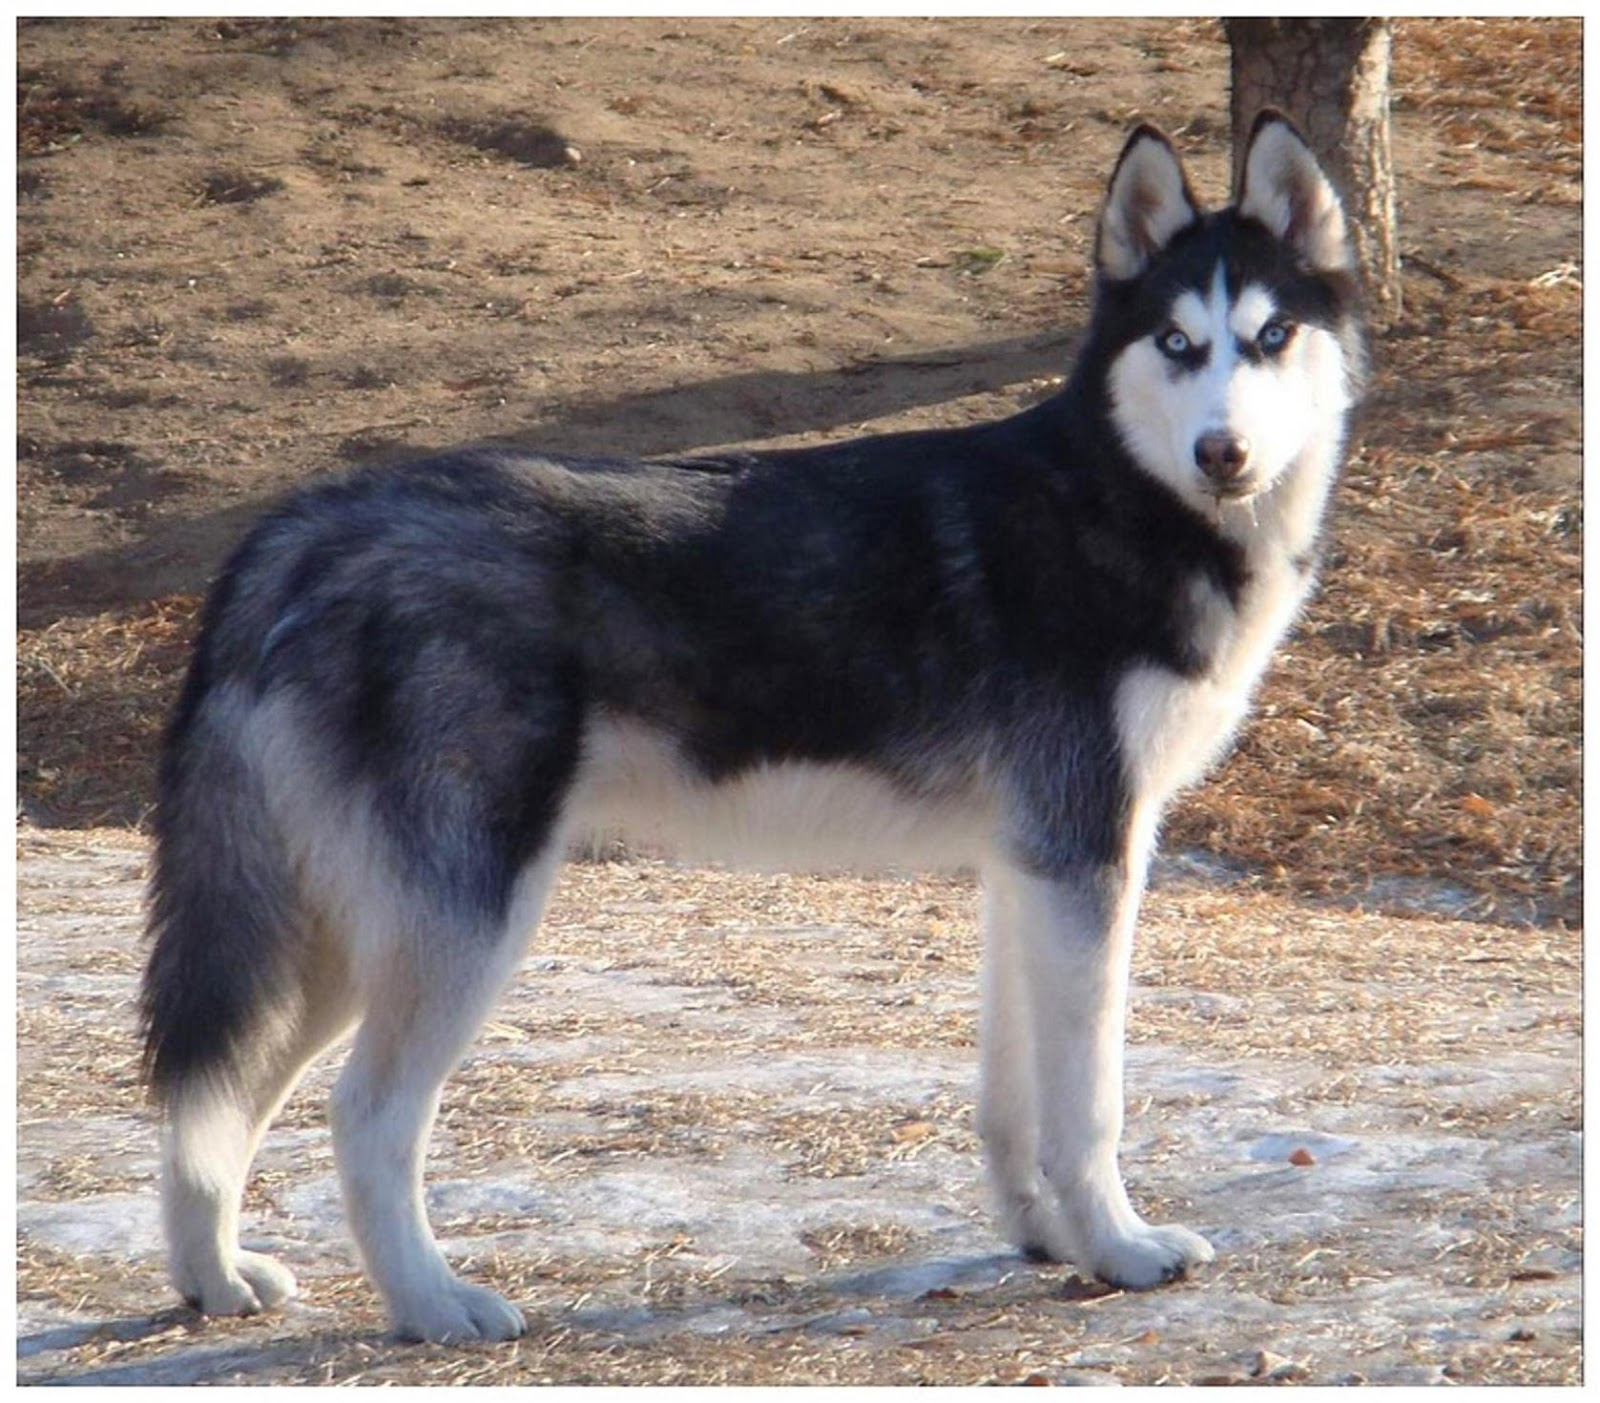 Siberian Husky Red Wolf Mix Photo - Happy Dog Heaven  |Black Siberian Husky Wolf Mix